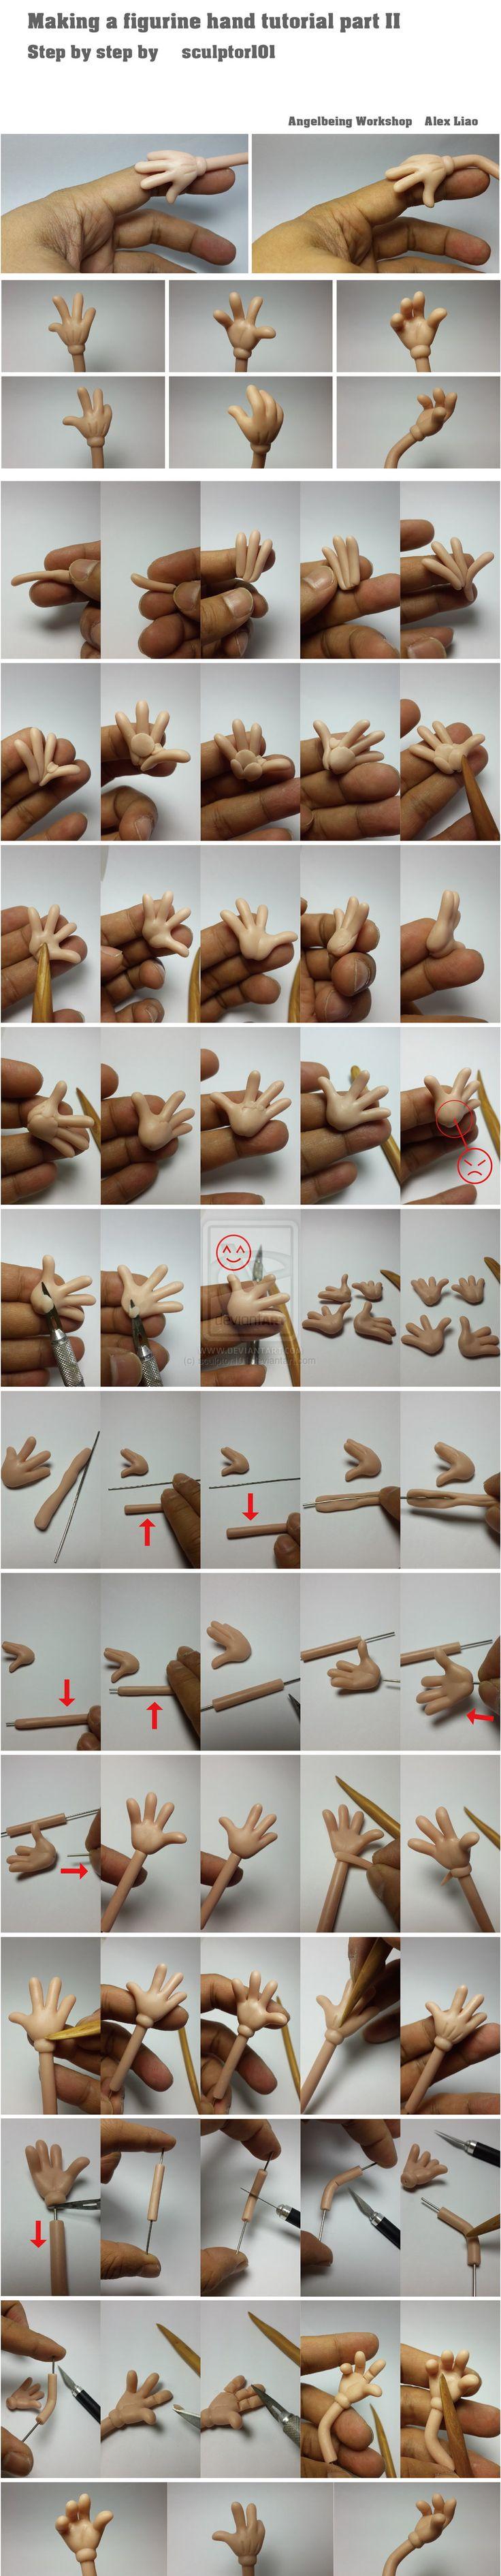 Making figurine hand tutorial part 2 by sculptor101.deviantart.com